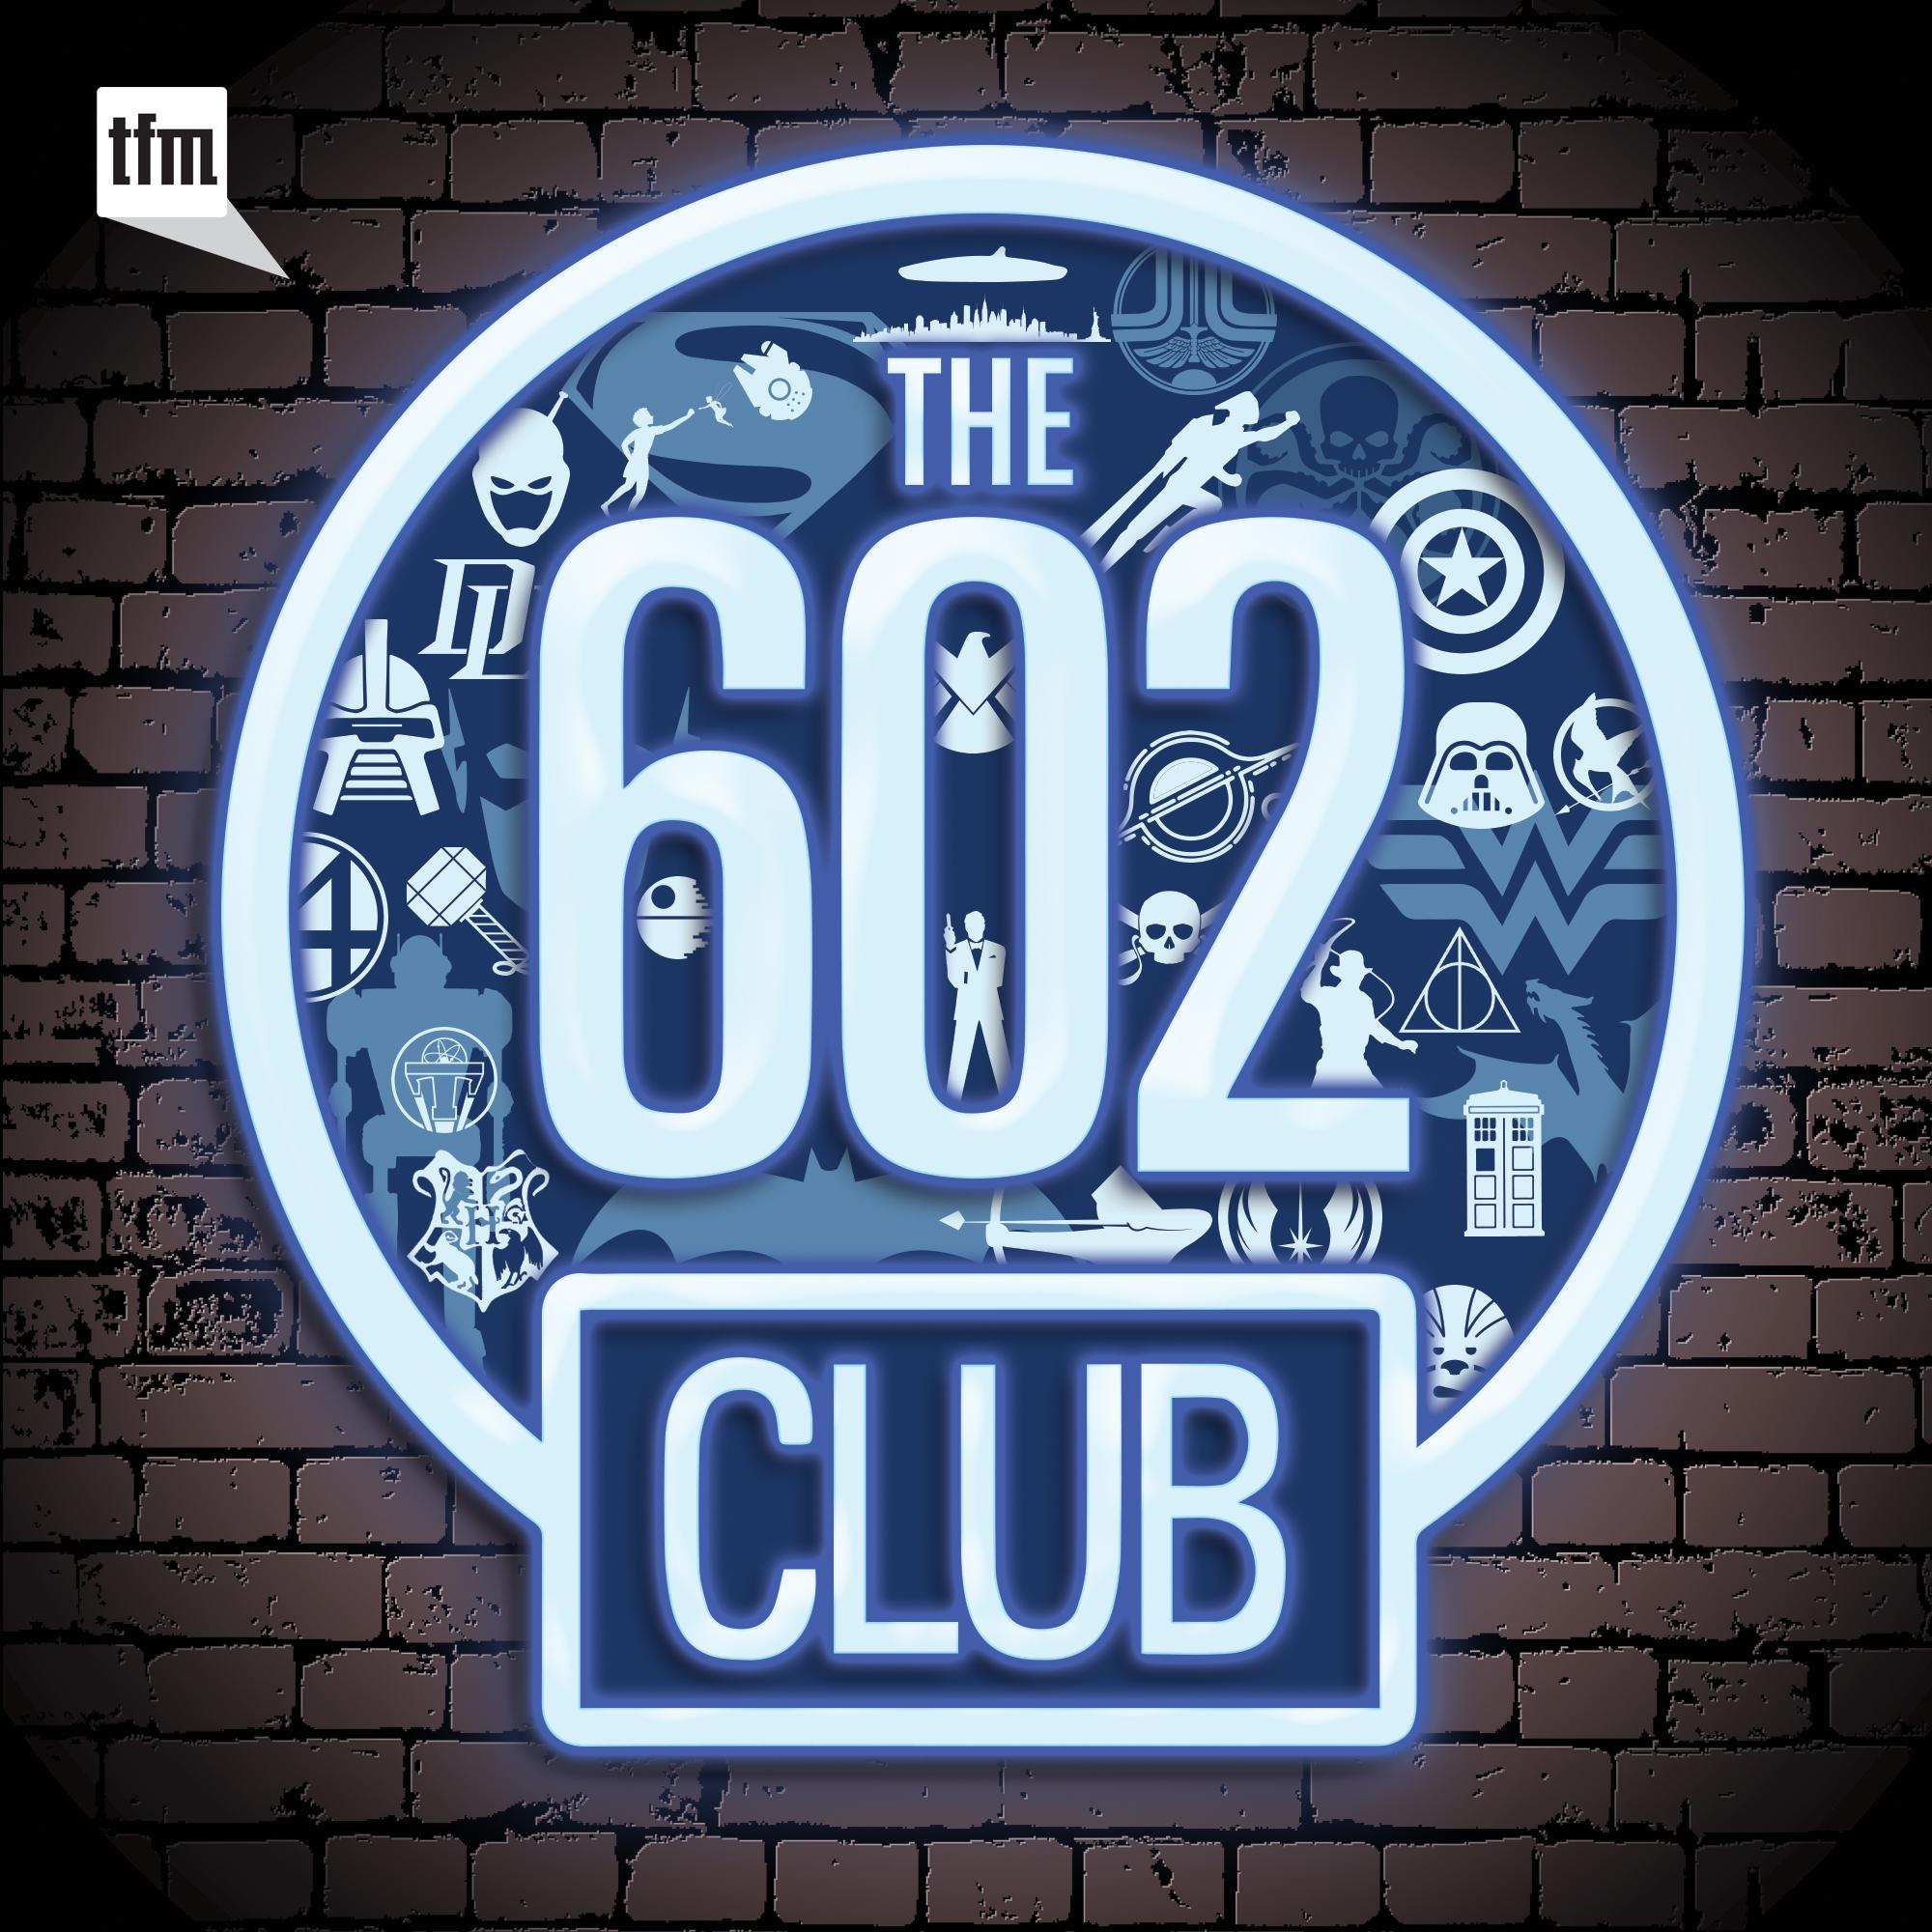 The 602 Club: A Geekery Speakeasy